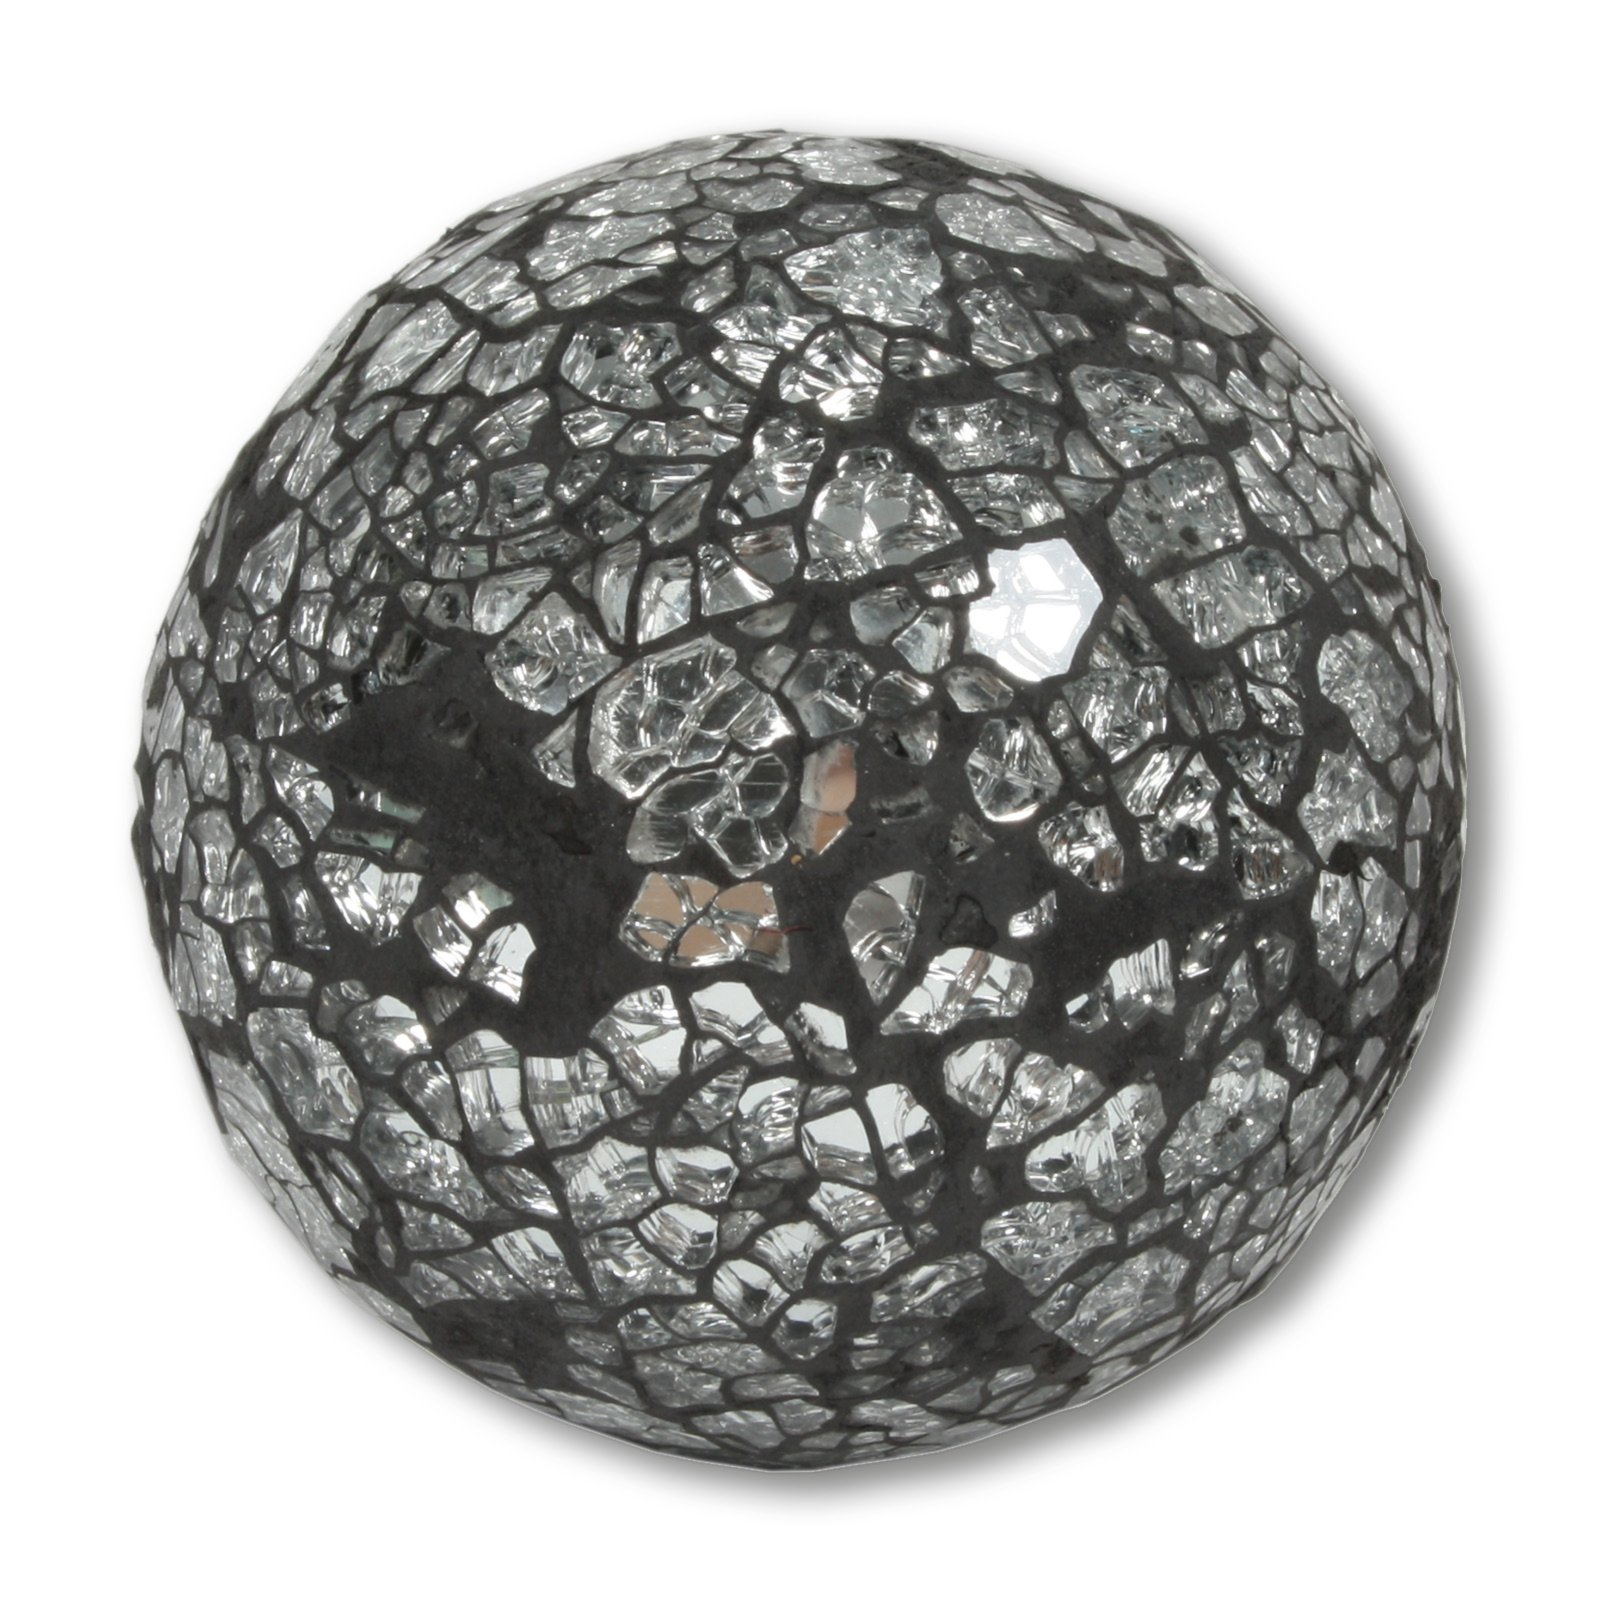 Deko-Kugel - silber - Mosaik - 8 cm Durchmesser